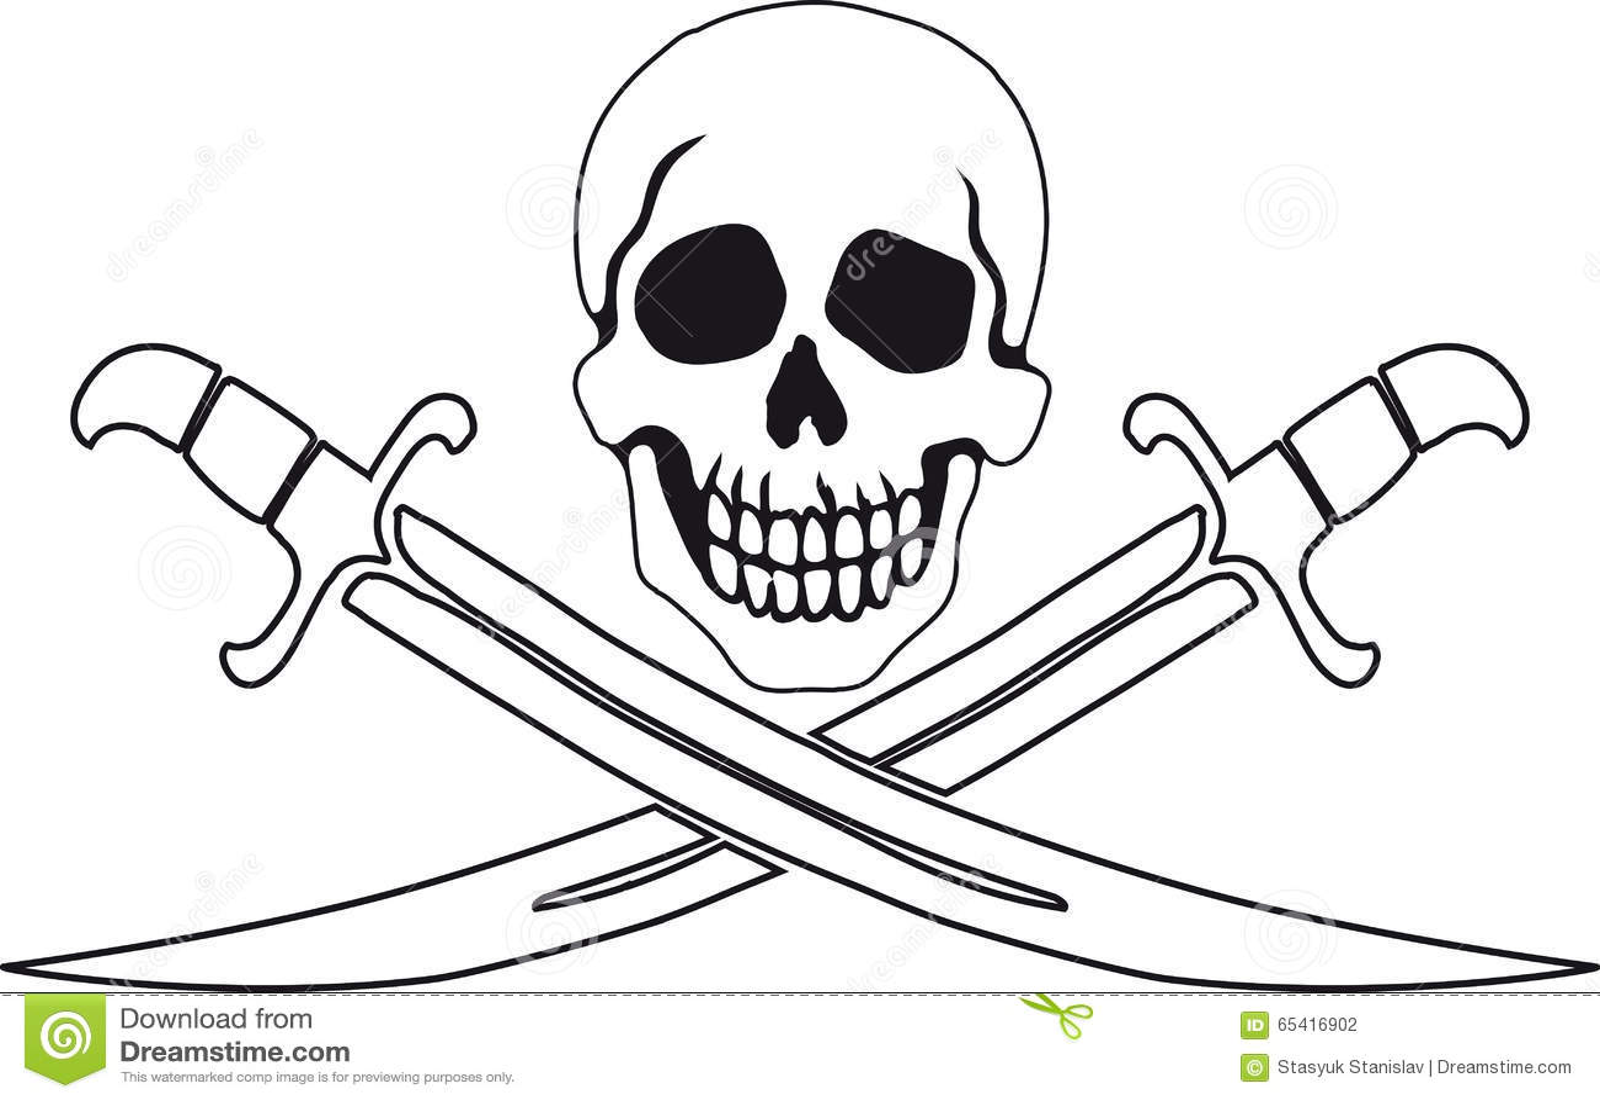 Símbolo Roger alegre do pirata